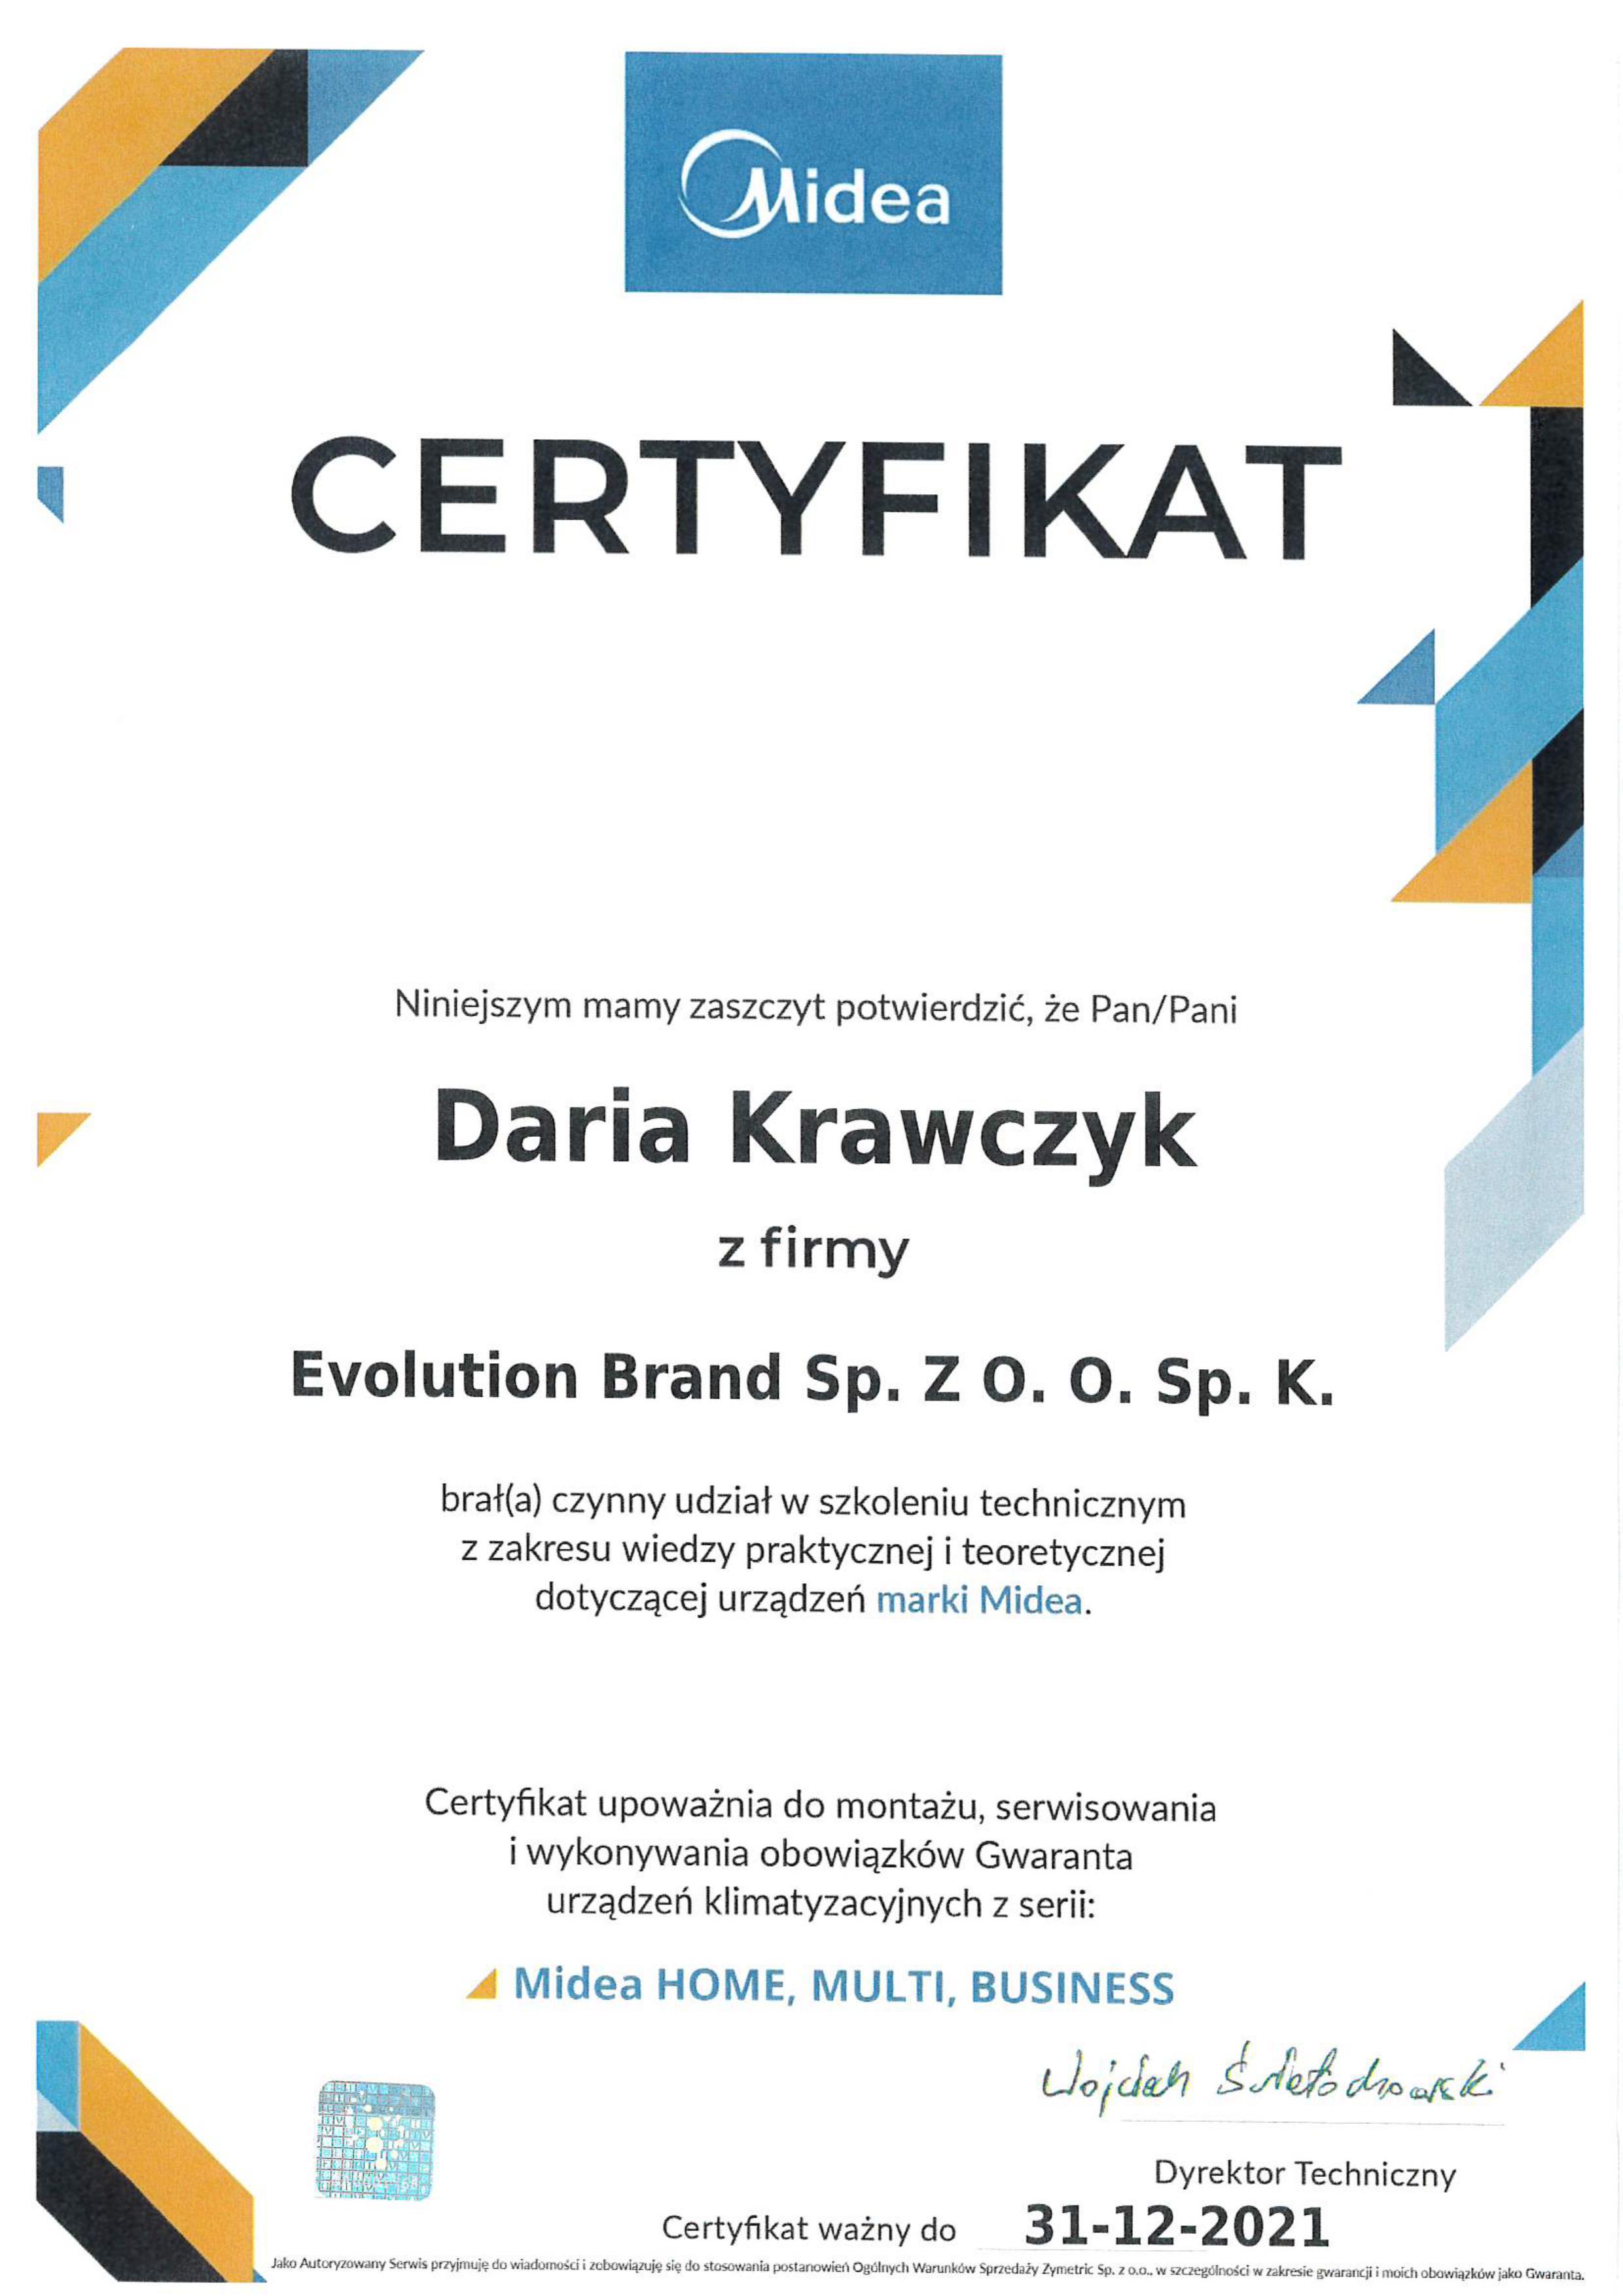 Certyfikat Midea 2021